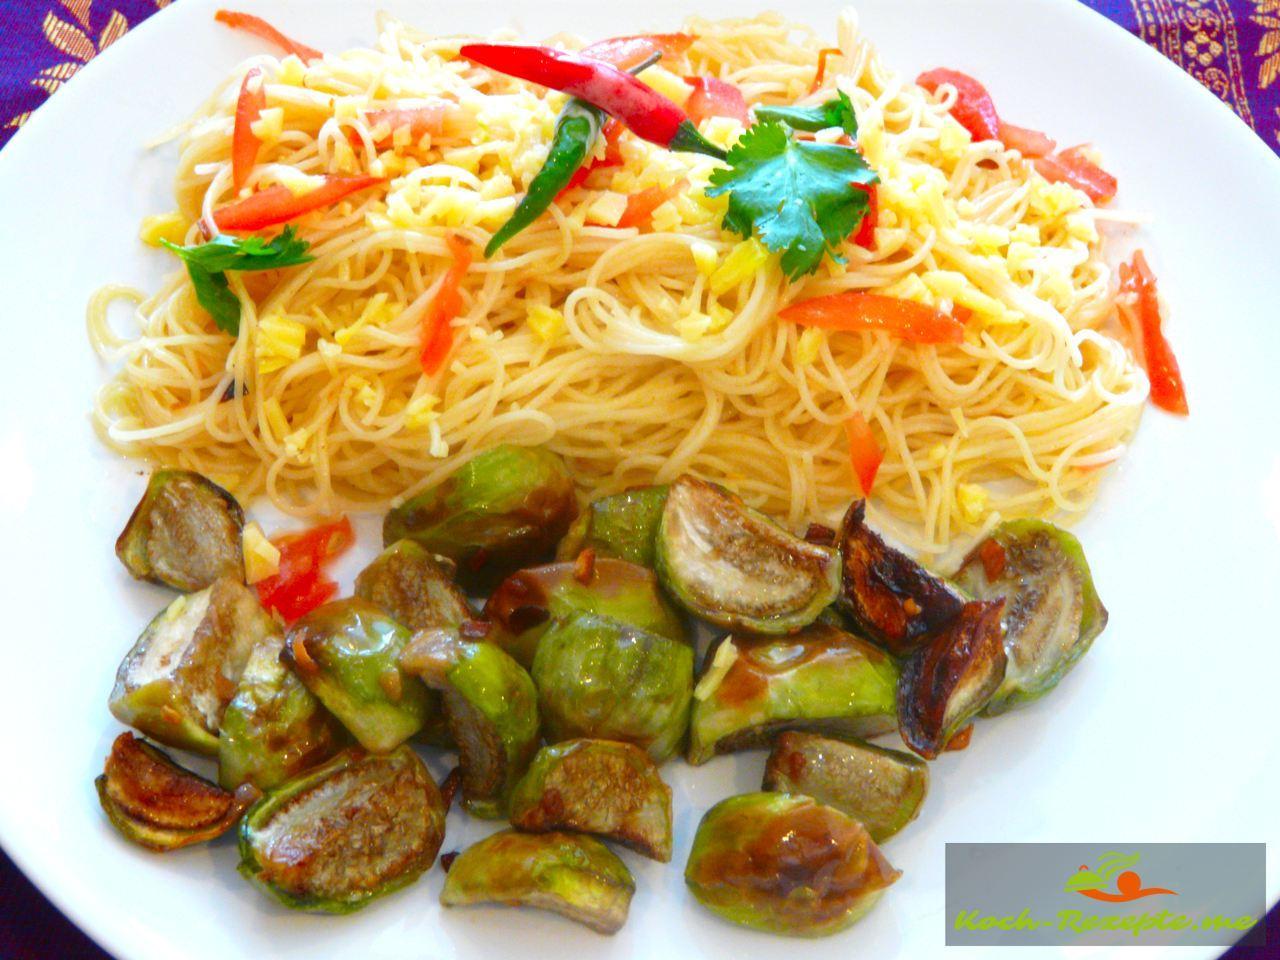 Knoblauch-Chili Spaghetti